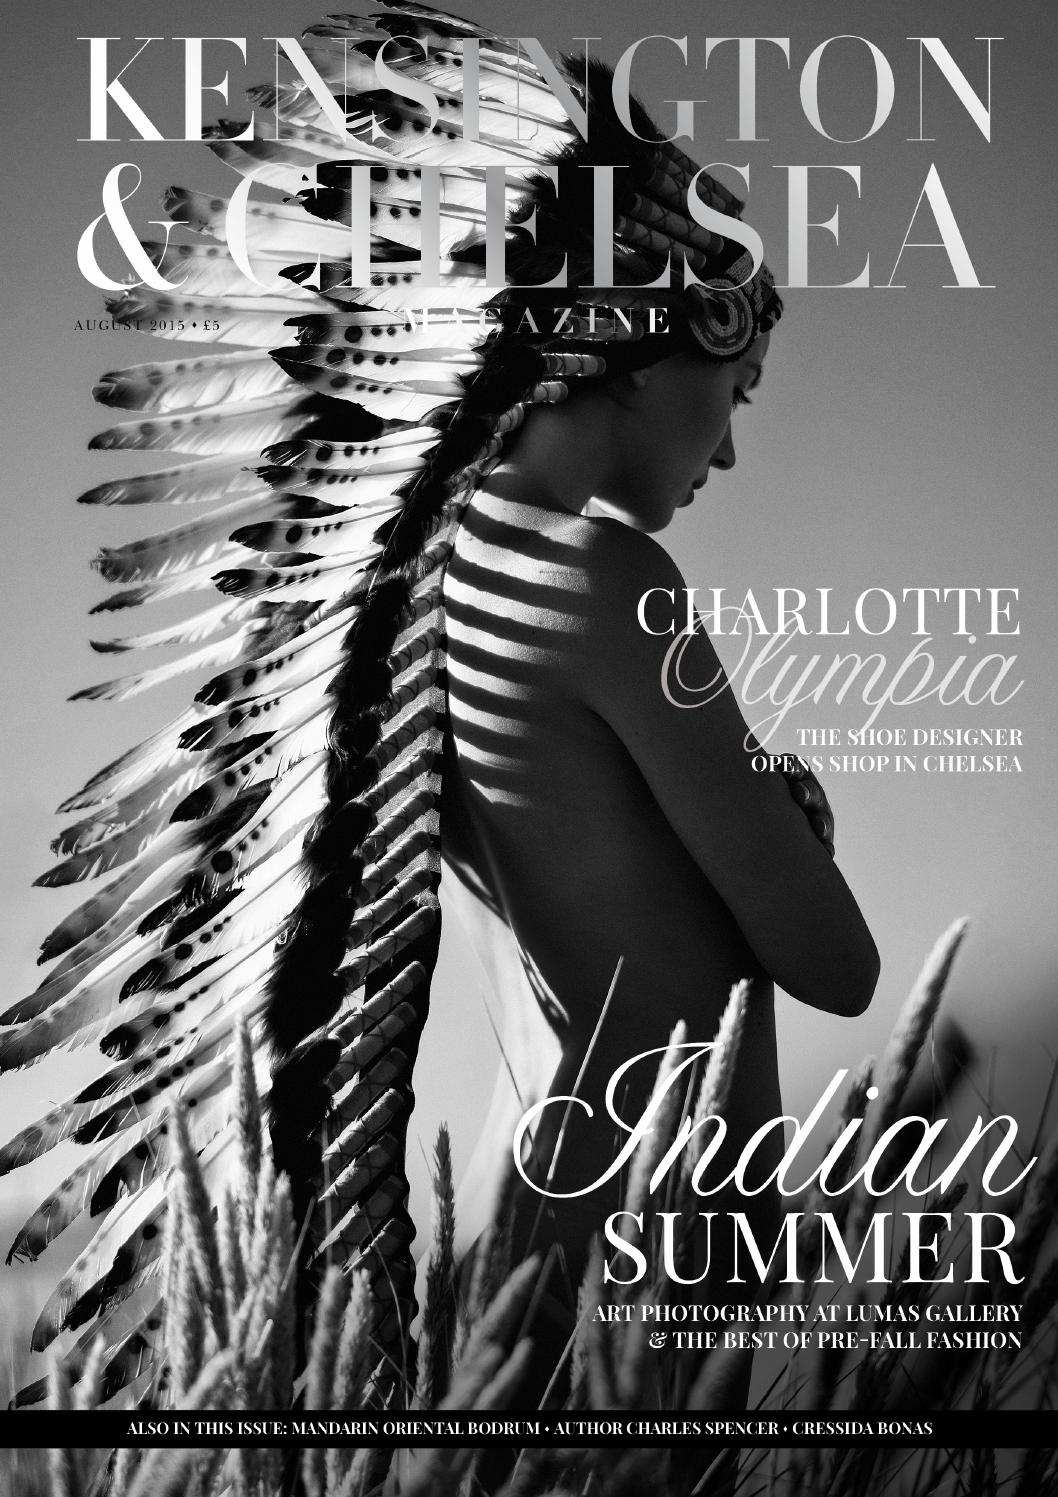 ca44c8fa5ebd3 The Kensington & Chelsea Magazine August 2015 by Runwild Media Group ...